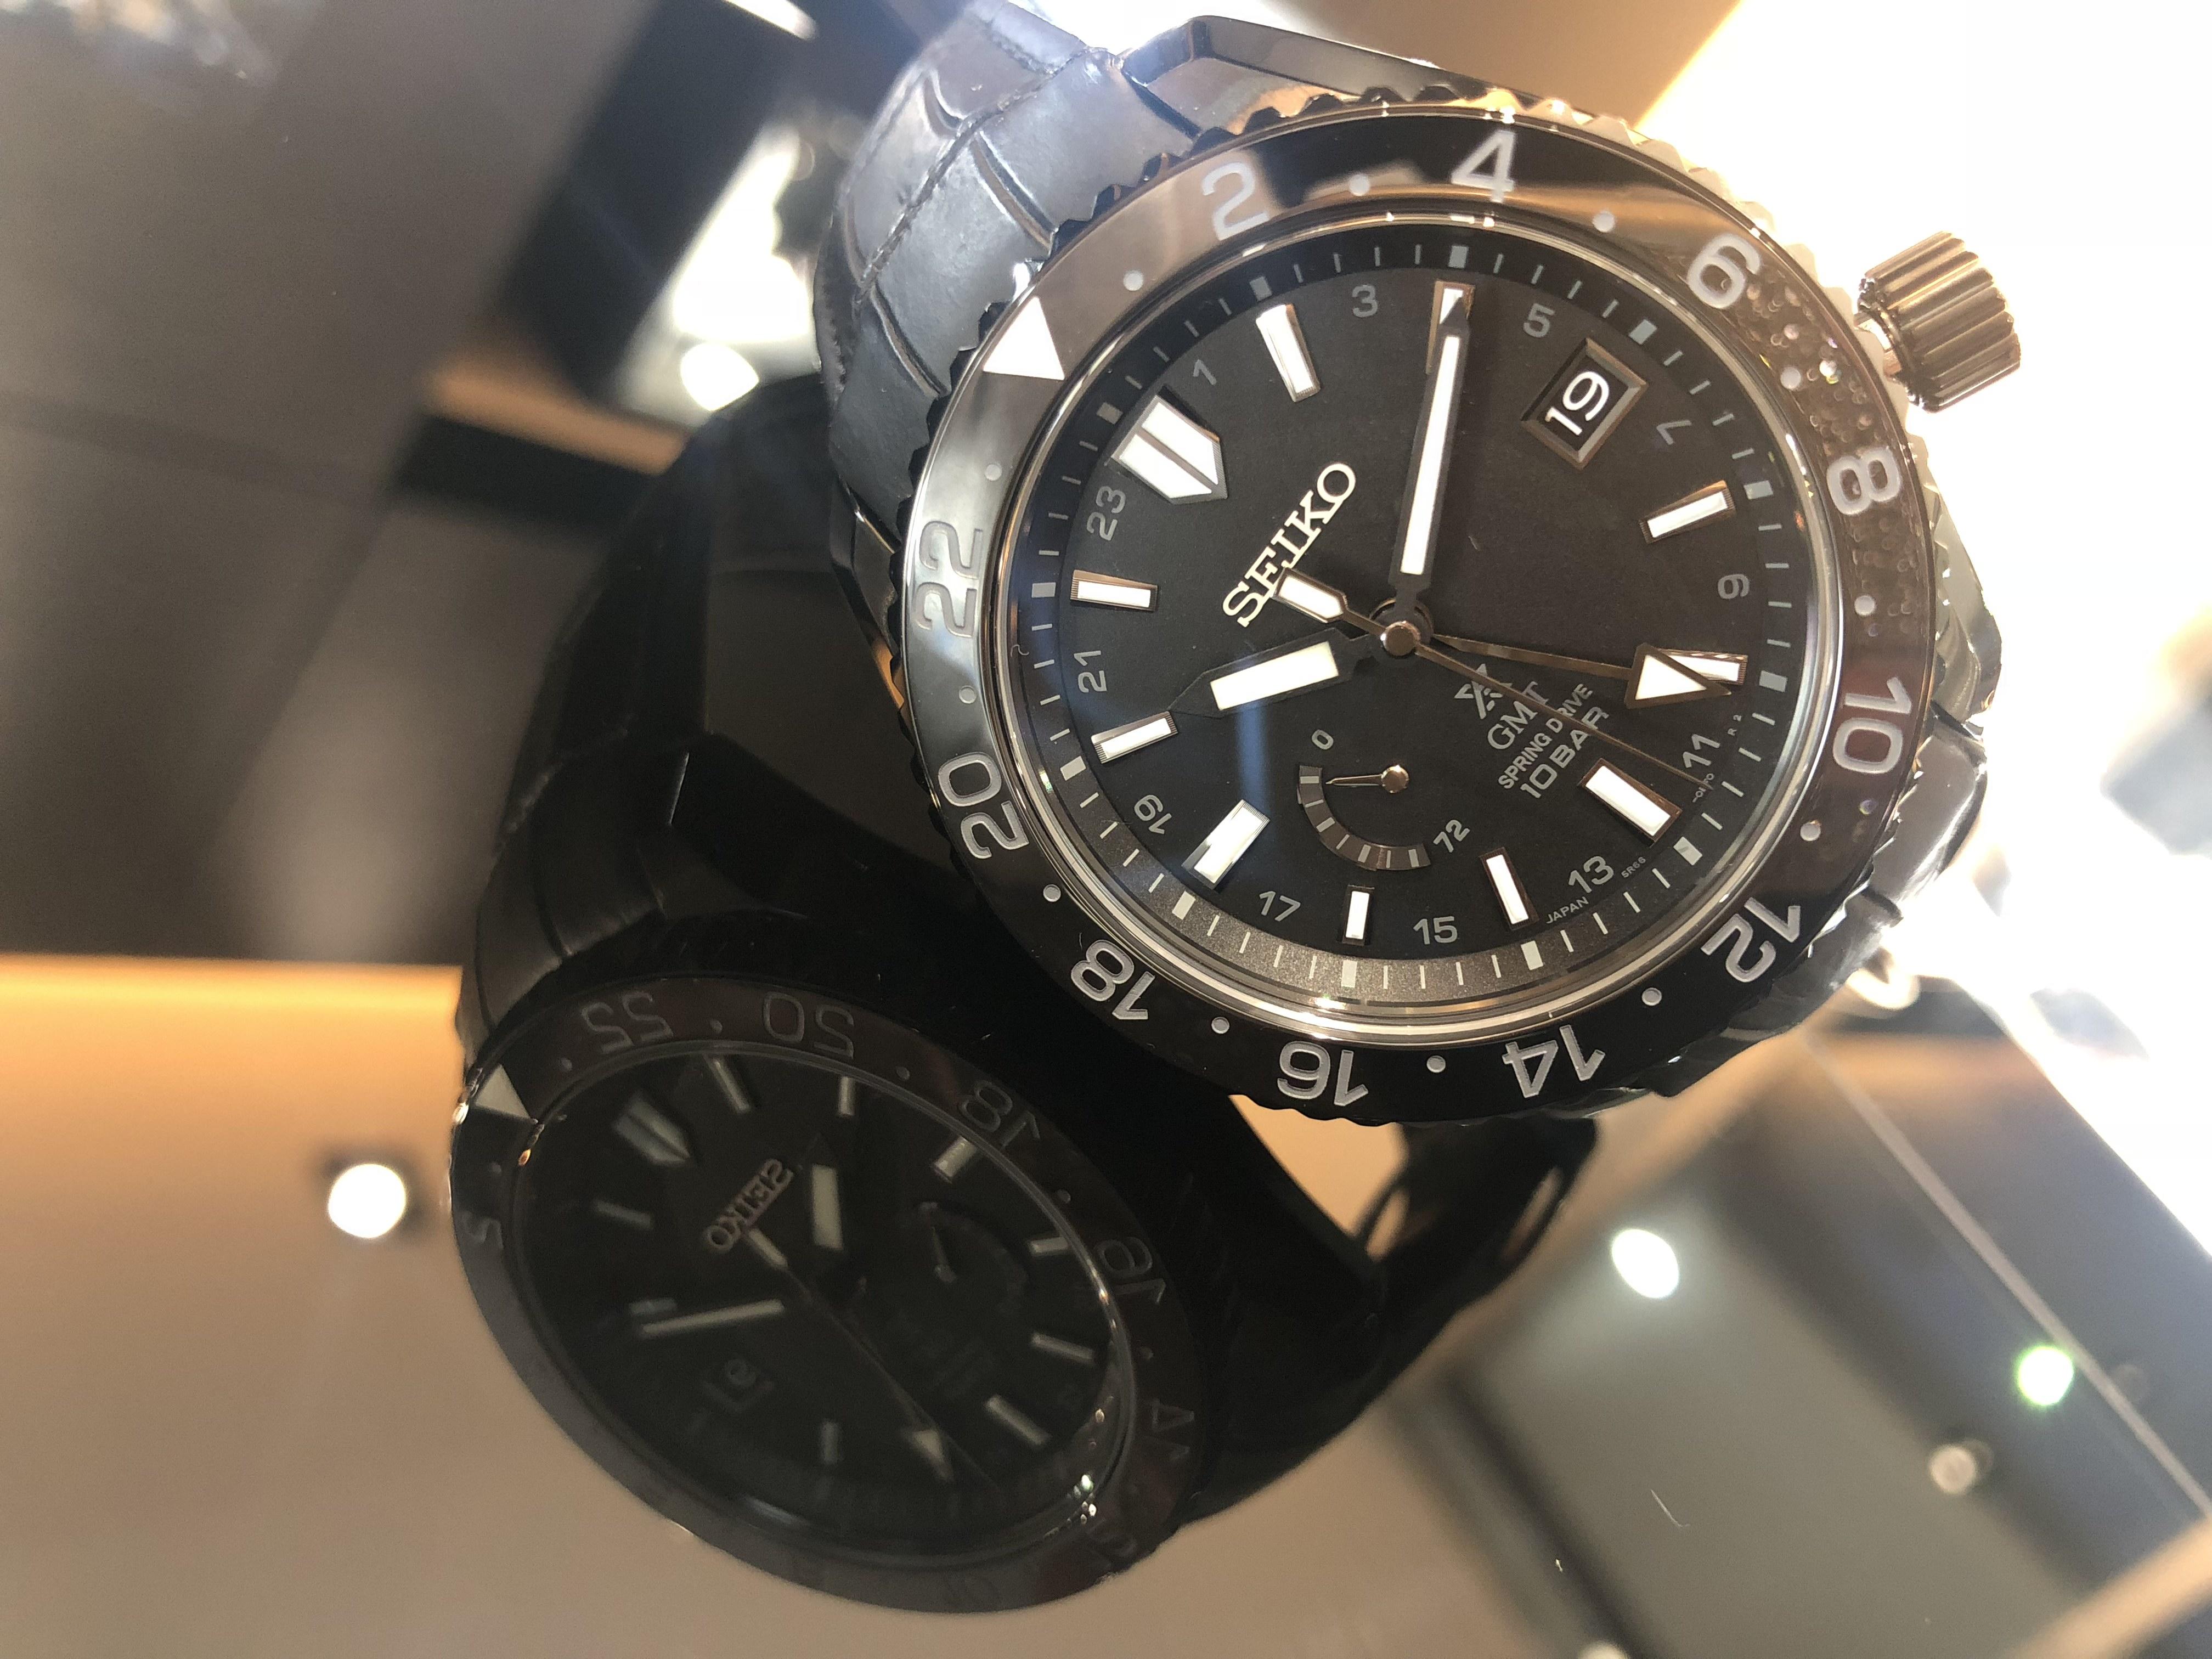 meet 6b8d4 0c506 セイコー(SEIKO) プロスペックス PROSPEX | ブランド腕時計の ...